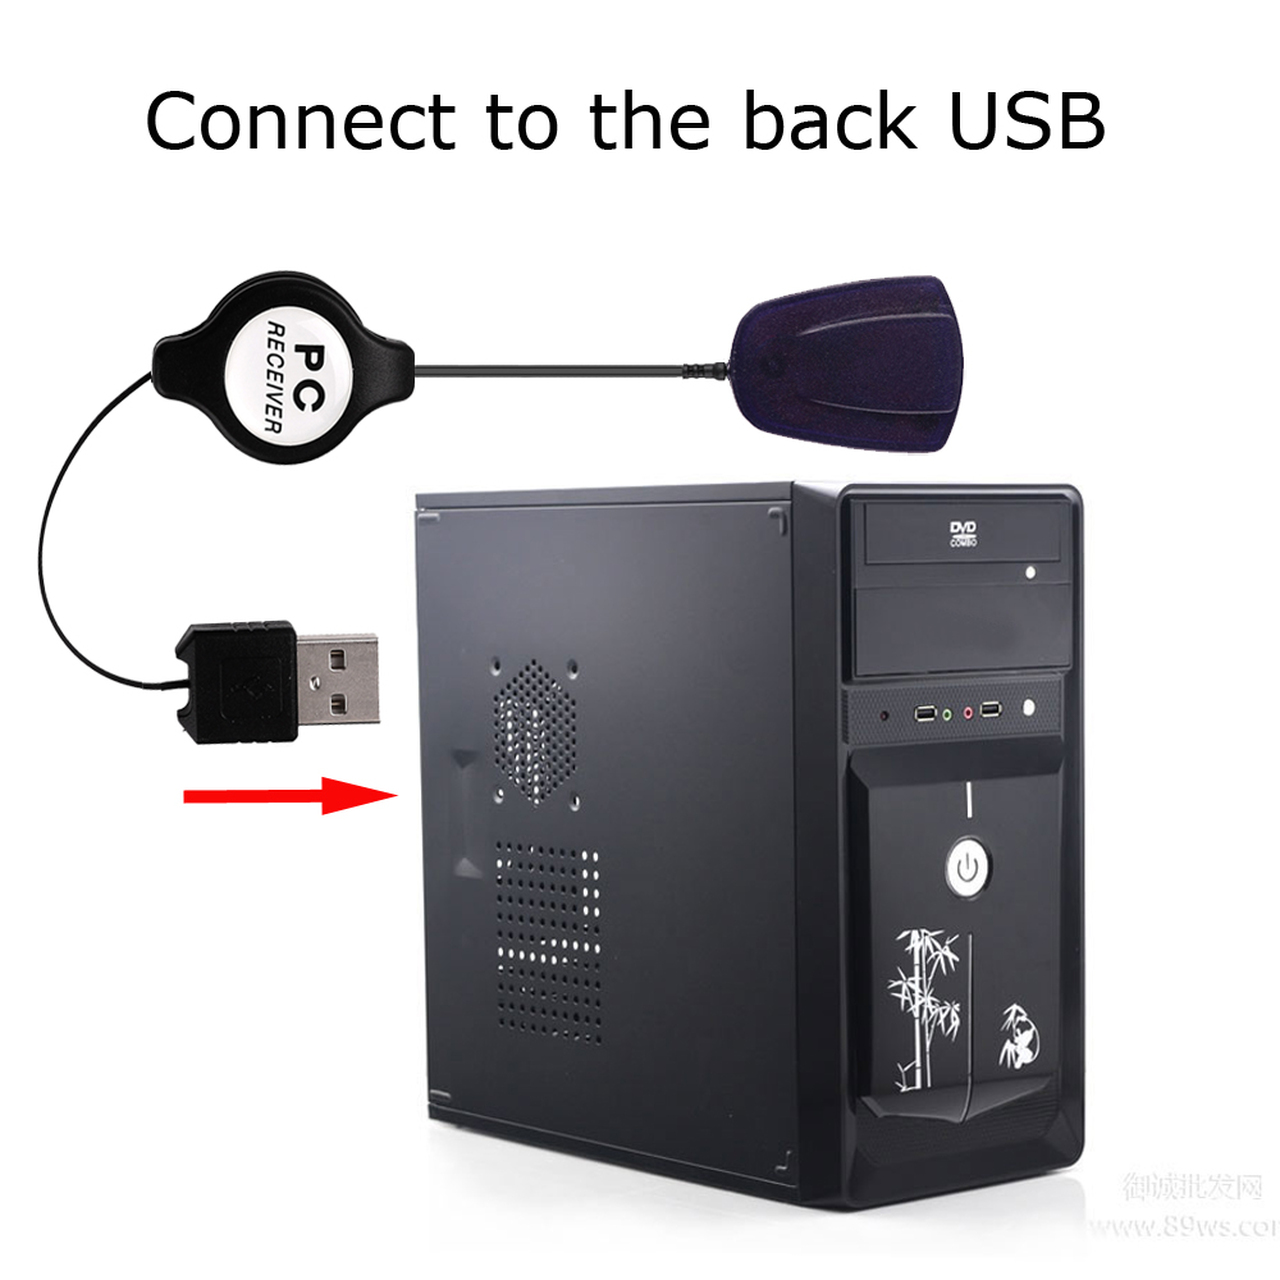 Wireless Mouse Remote Control Controller USB Receiver IR Remote Control for  Loptop PC Computer Center Windows 7 8 10 Xp Vista